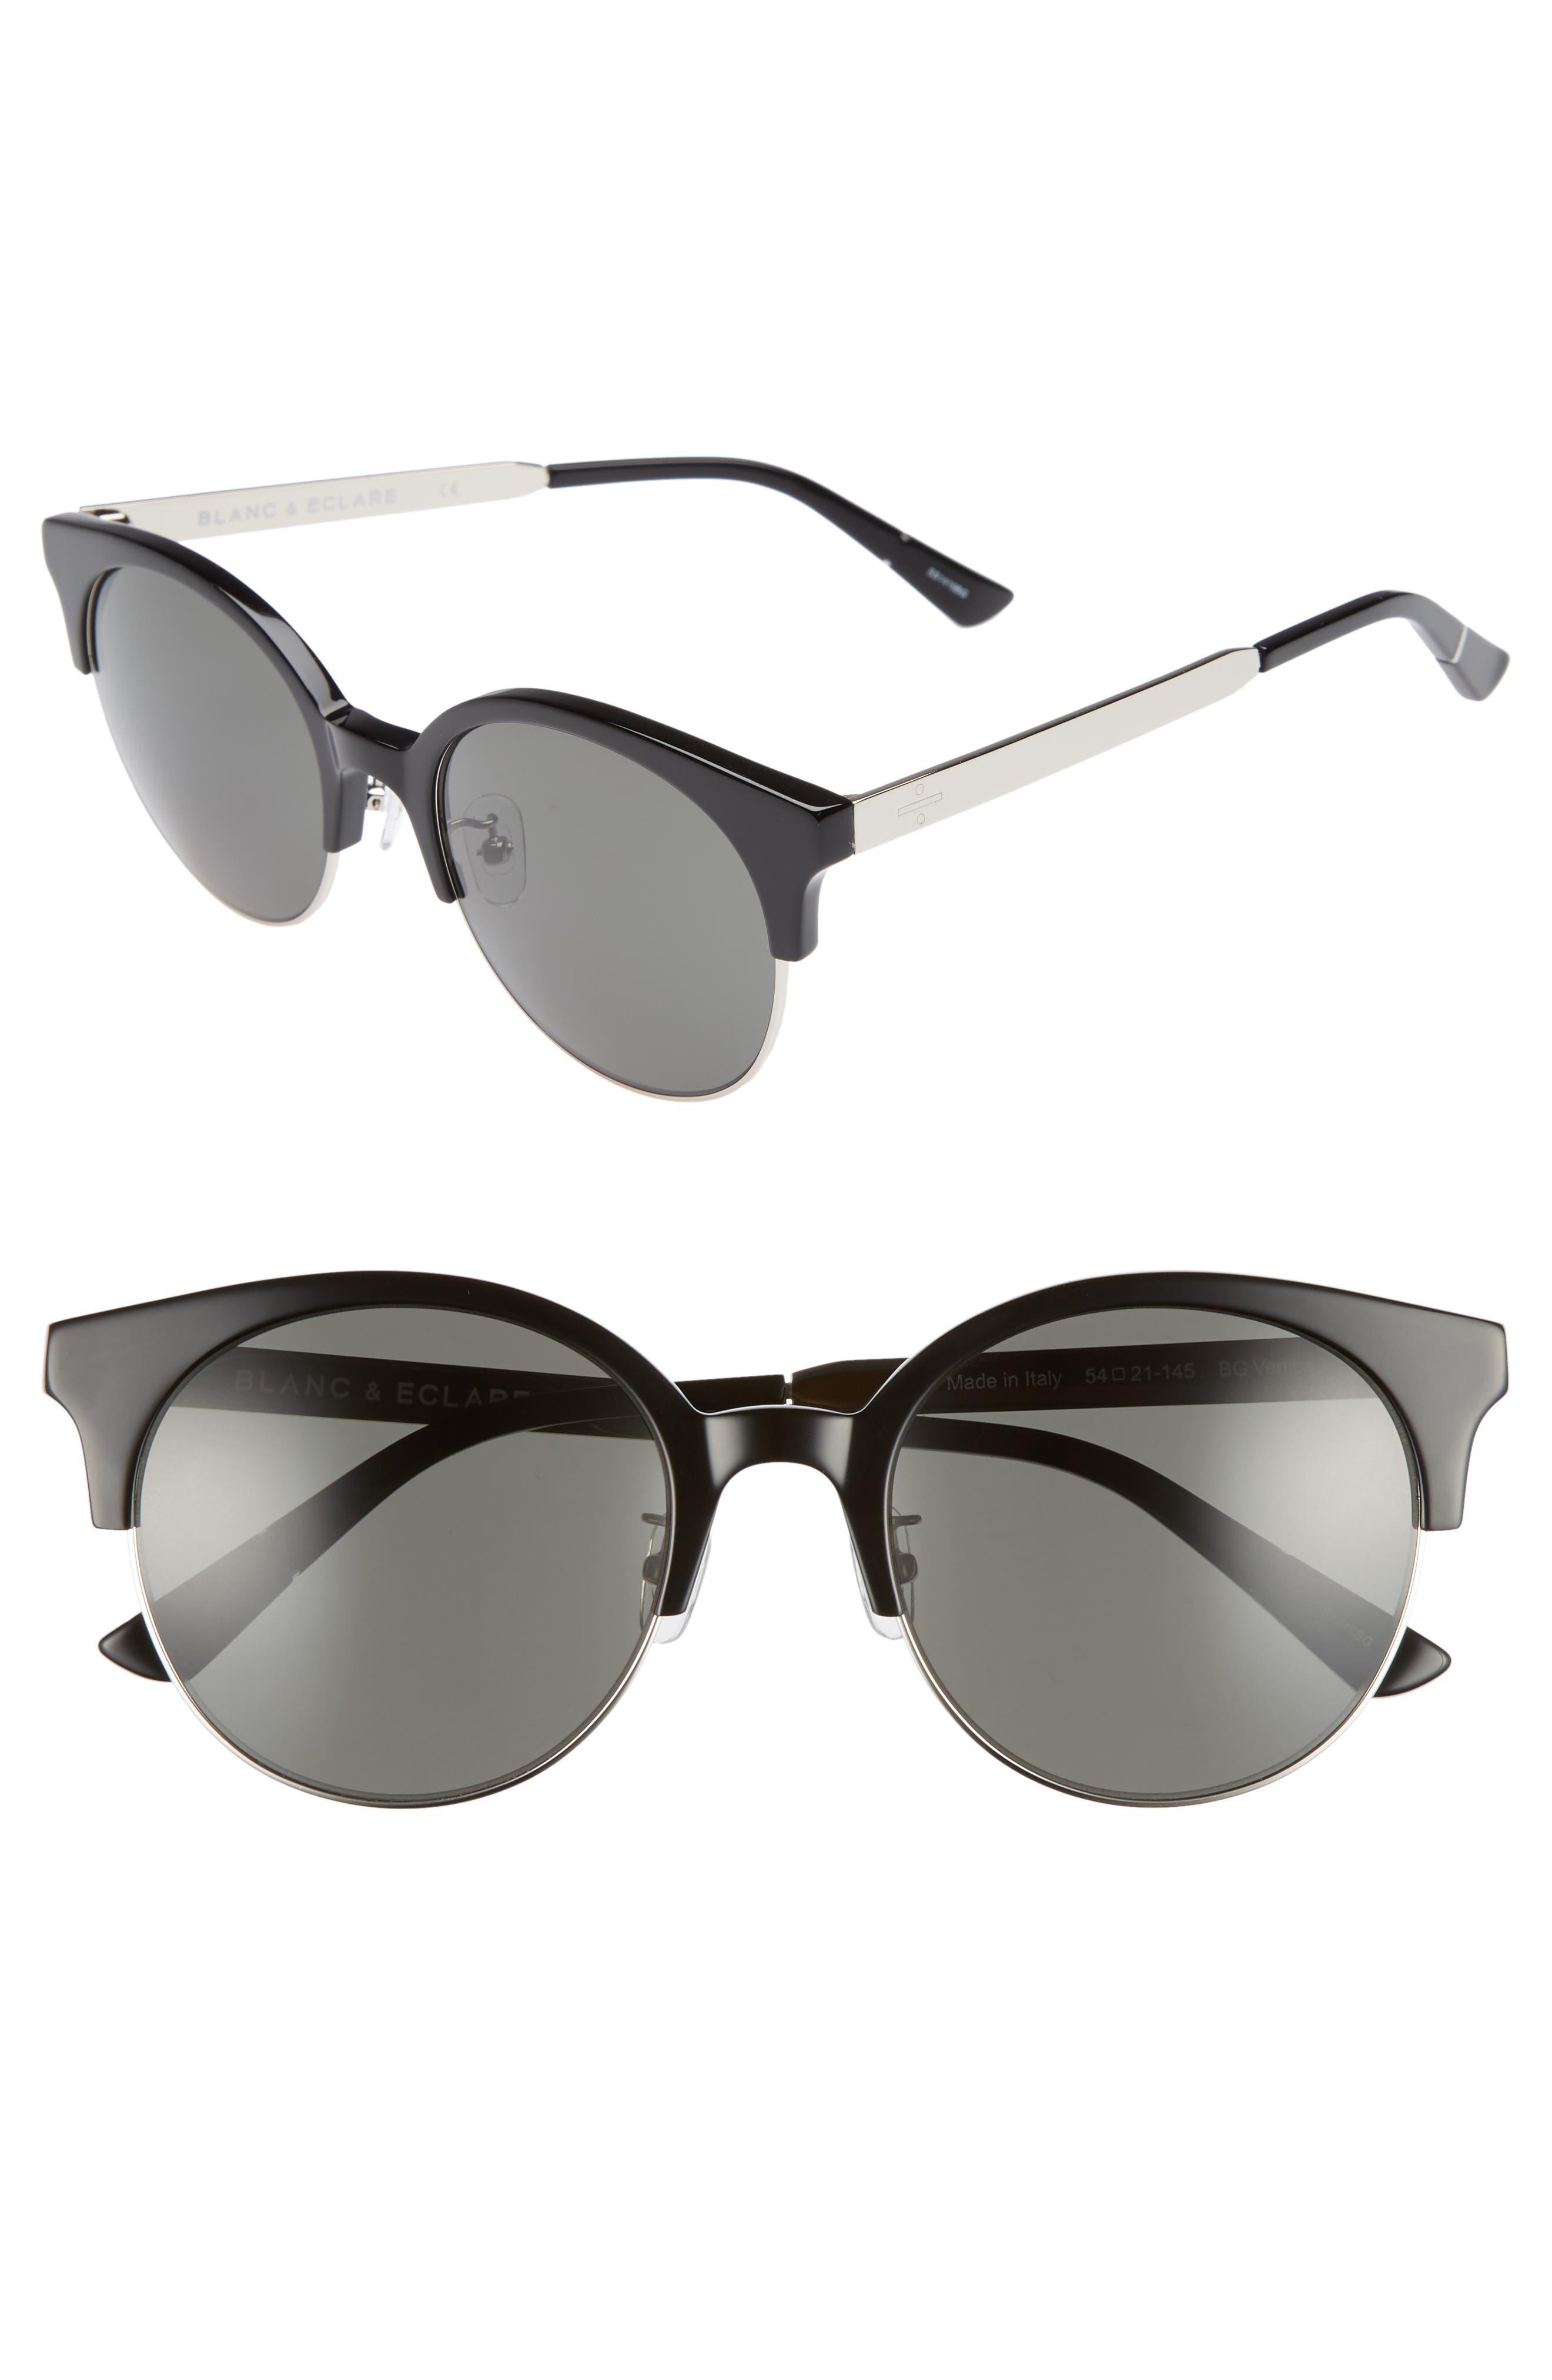 BLANC & ECLARE Venice Round Sunglasses,                         Main,                         color, 001